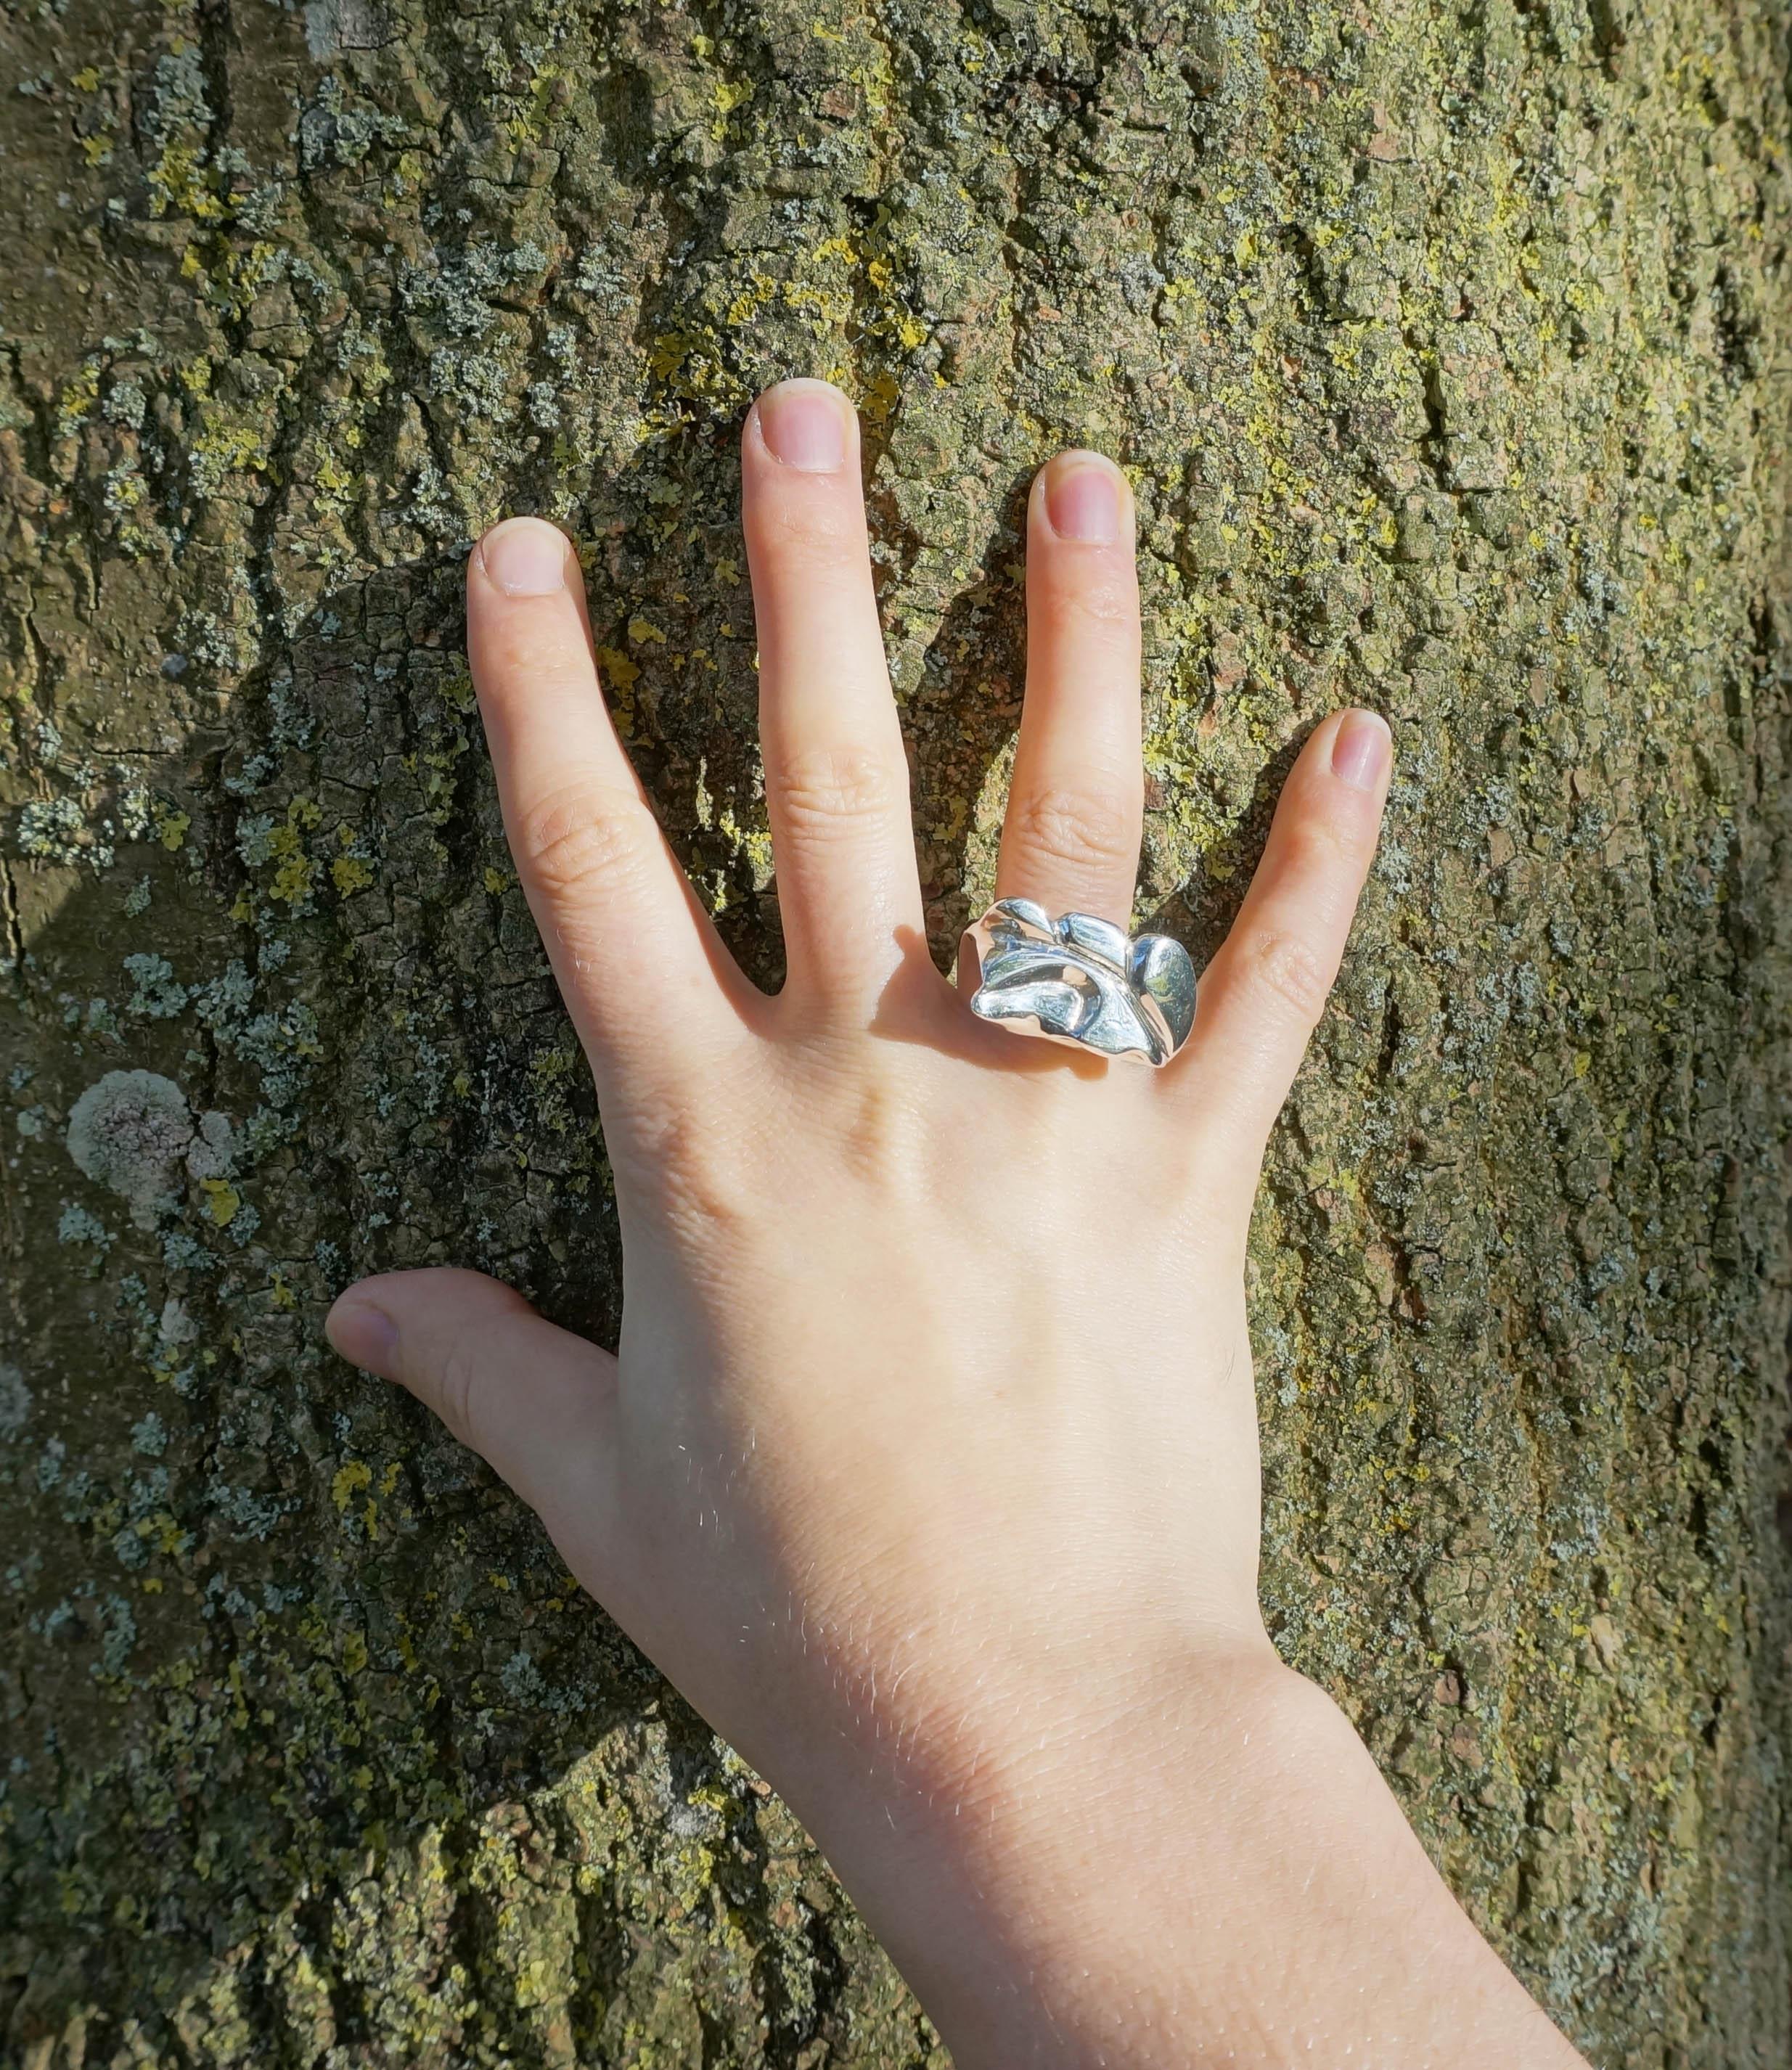 Caverns ring worn 5